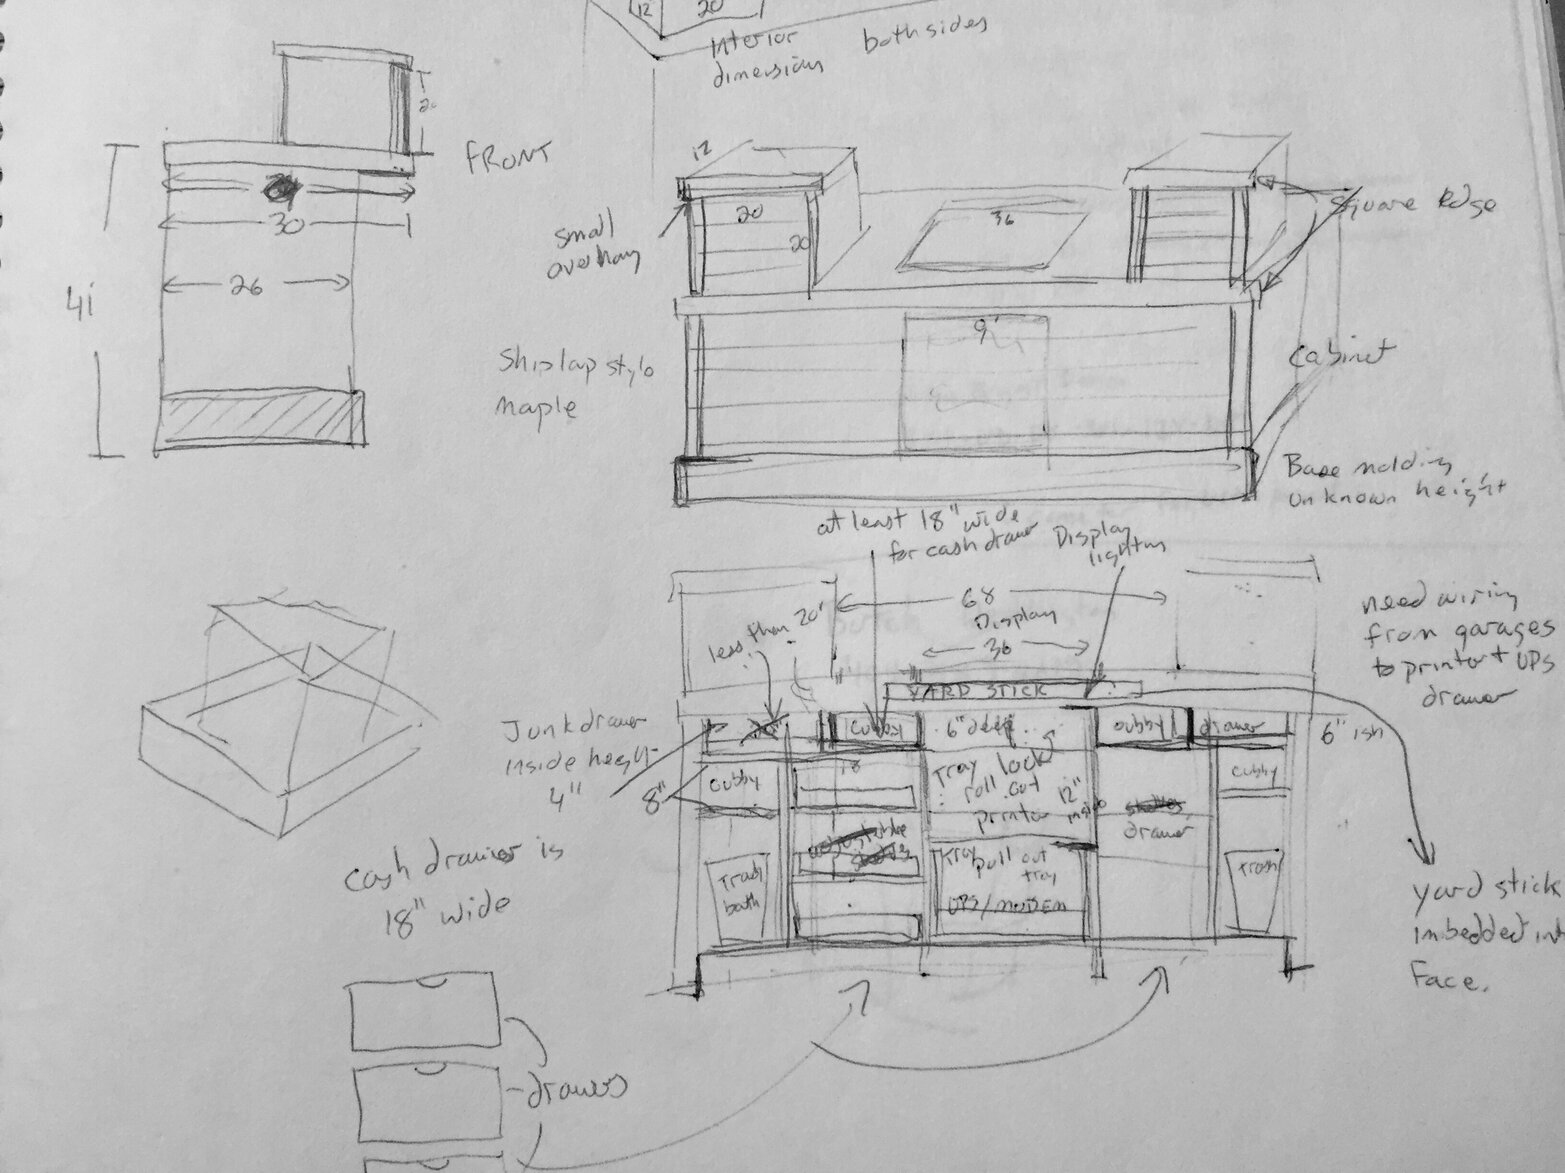 Alan Harp Sketch1